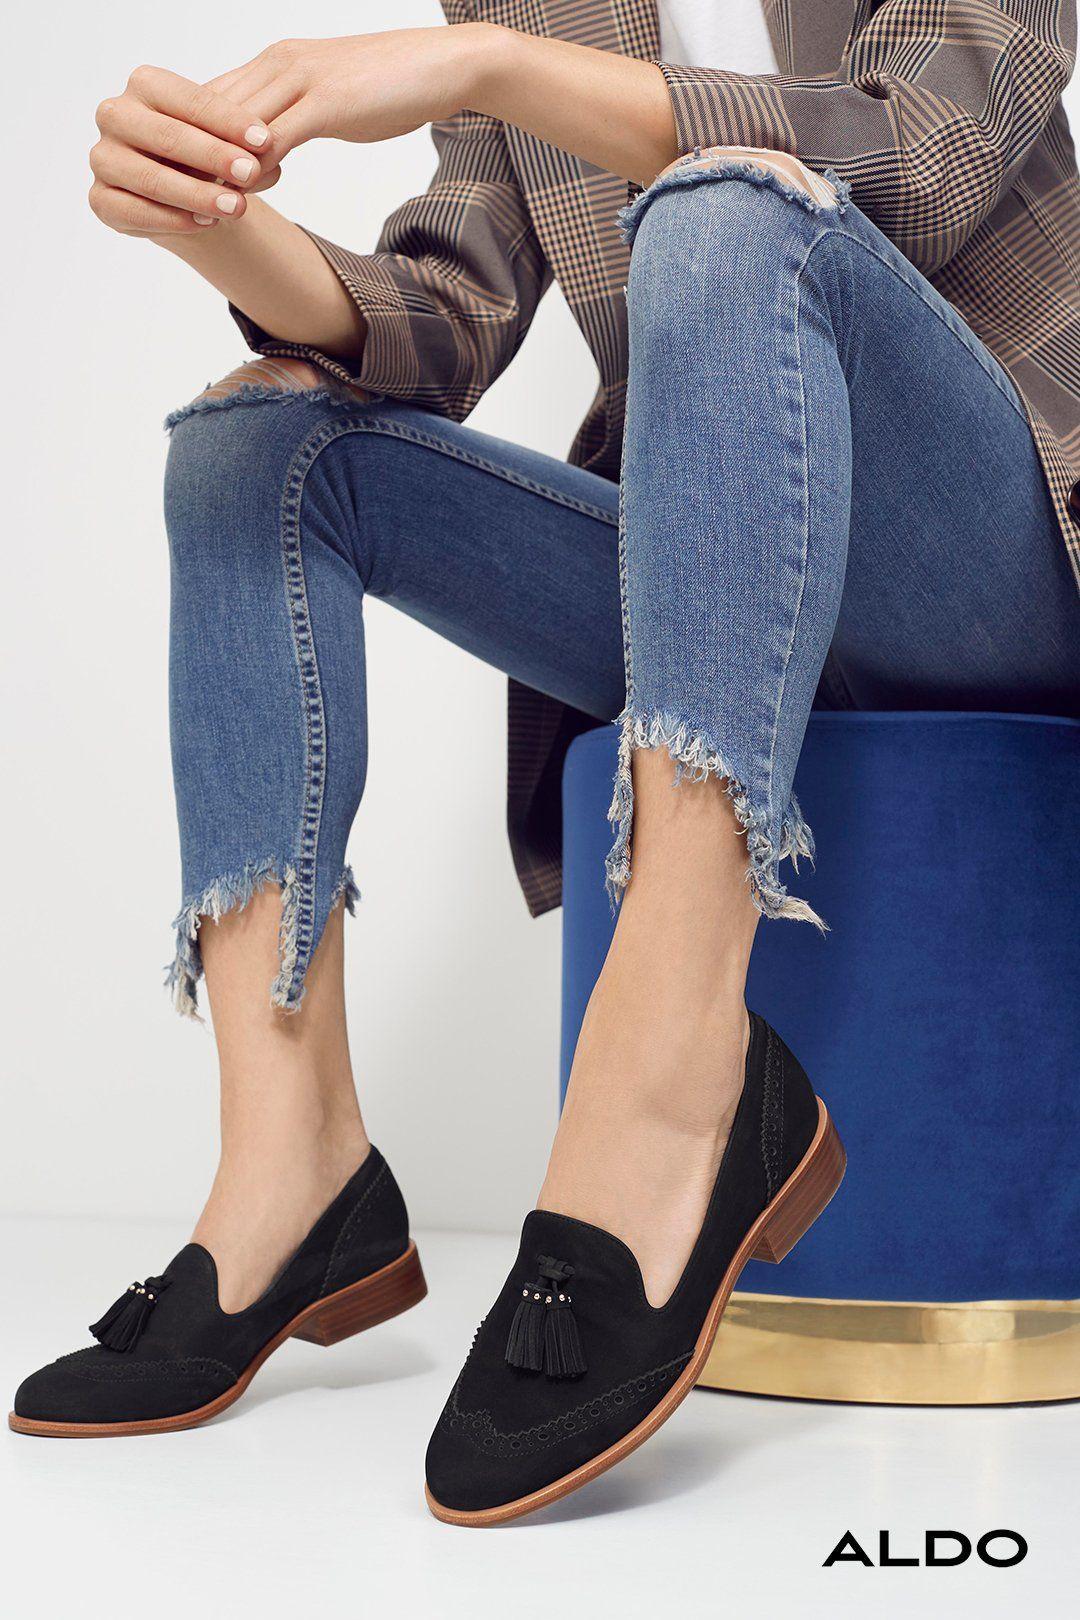 shoes women, Loafers for women, Women shoes